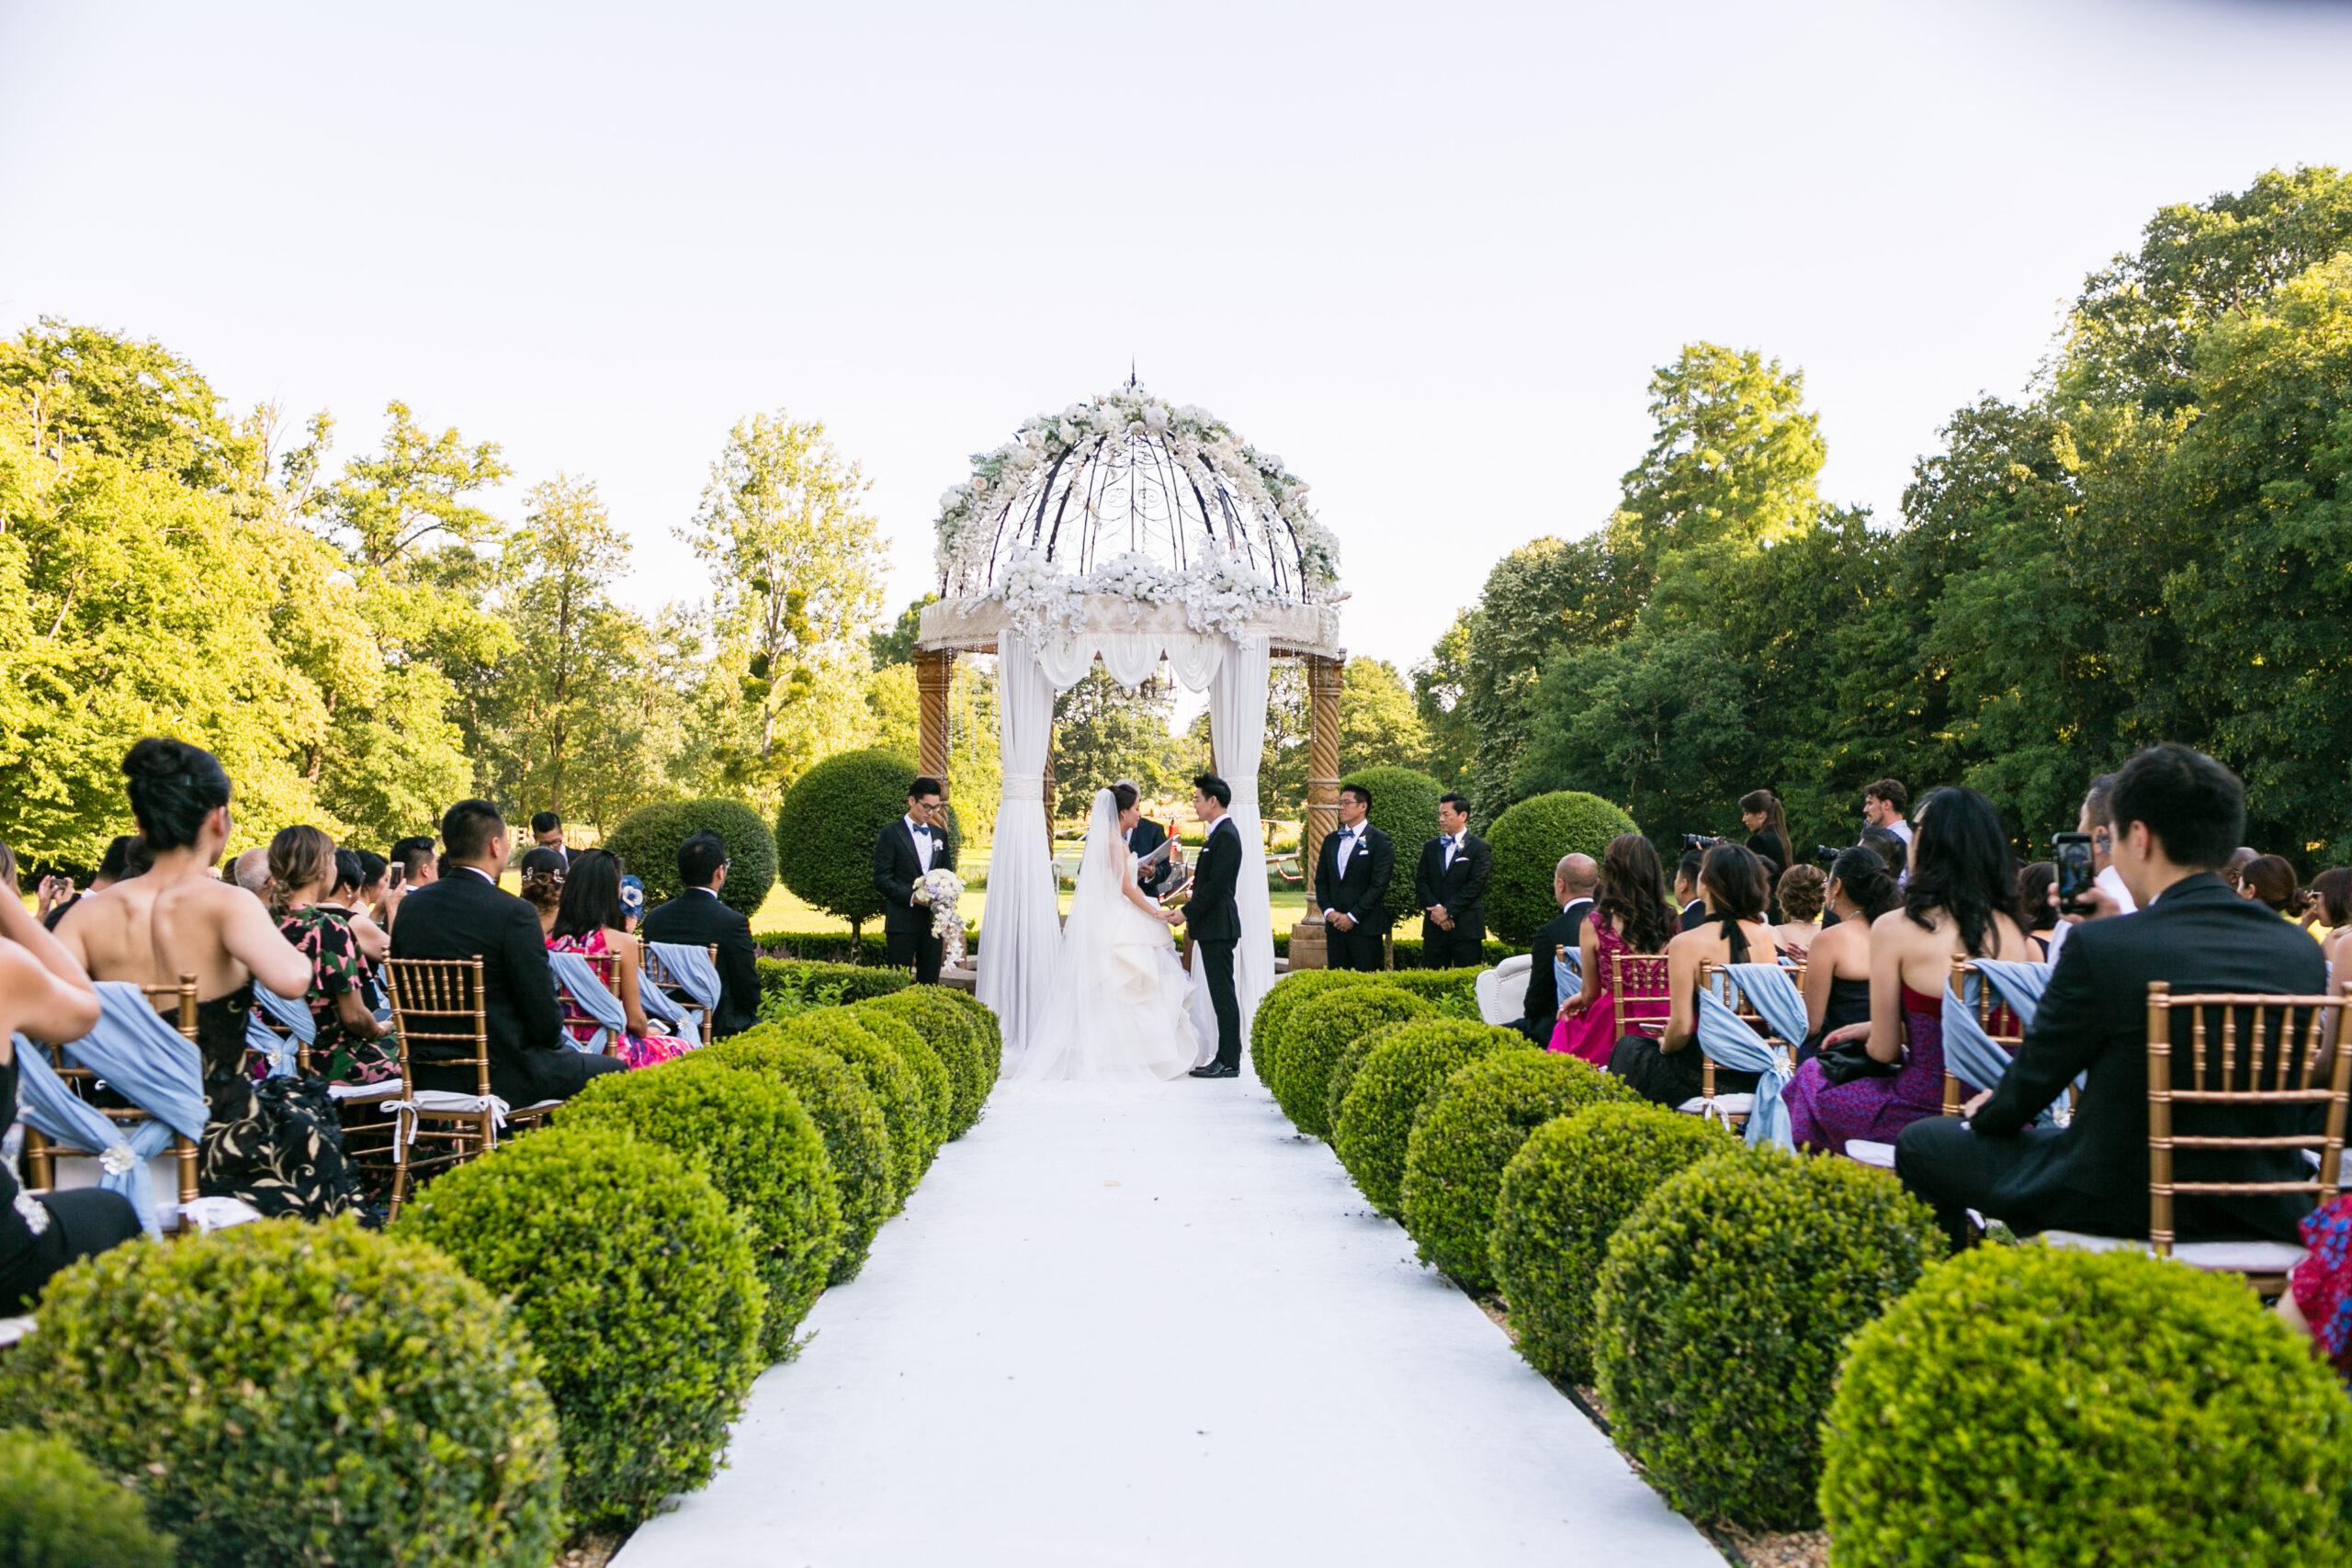 Carolyn & Henry's Fabulous French Fairytale Wedding